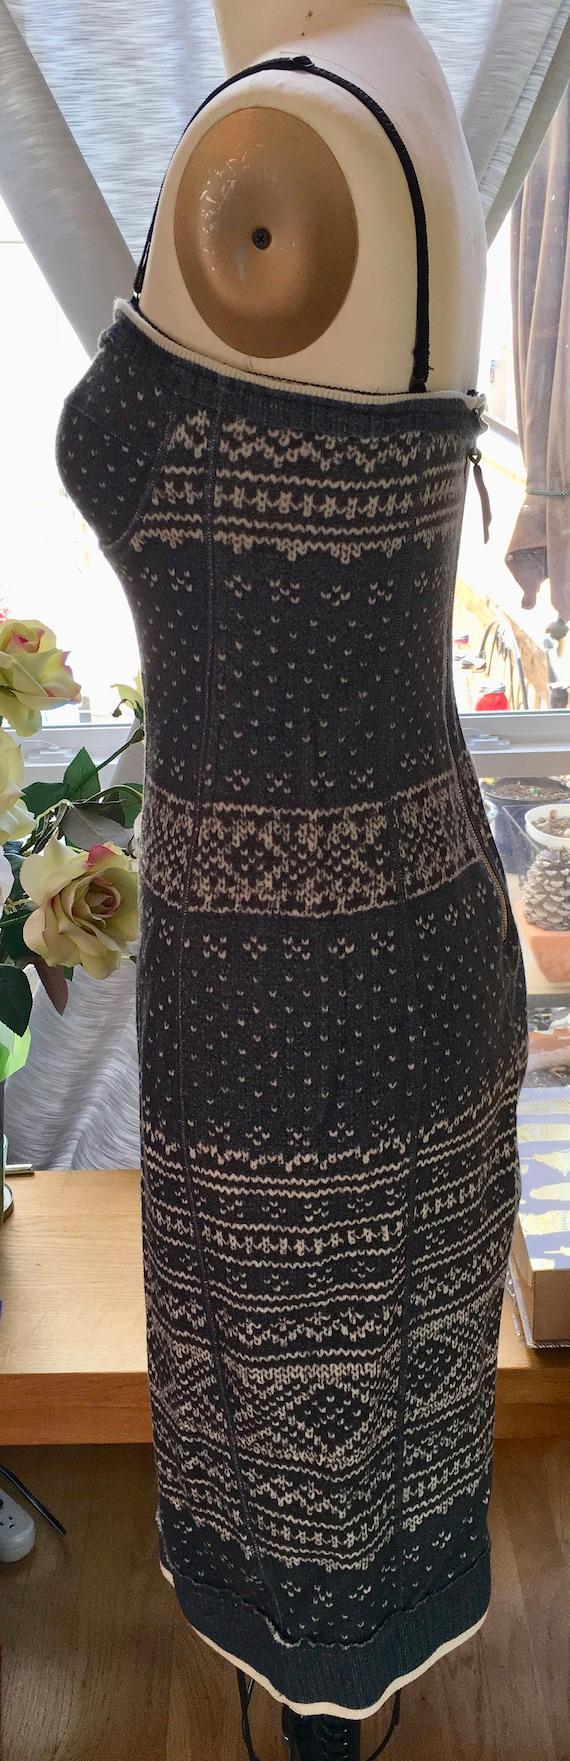 Dolce & Gabbana Bustier Nordic Knit Dress - image 2